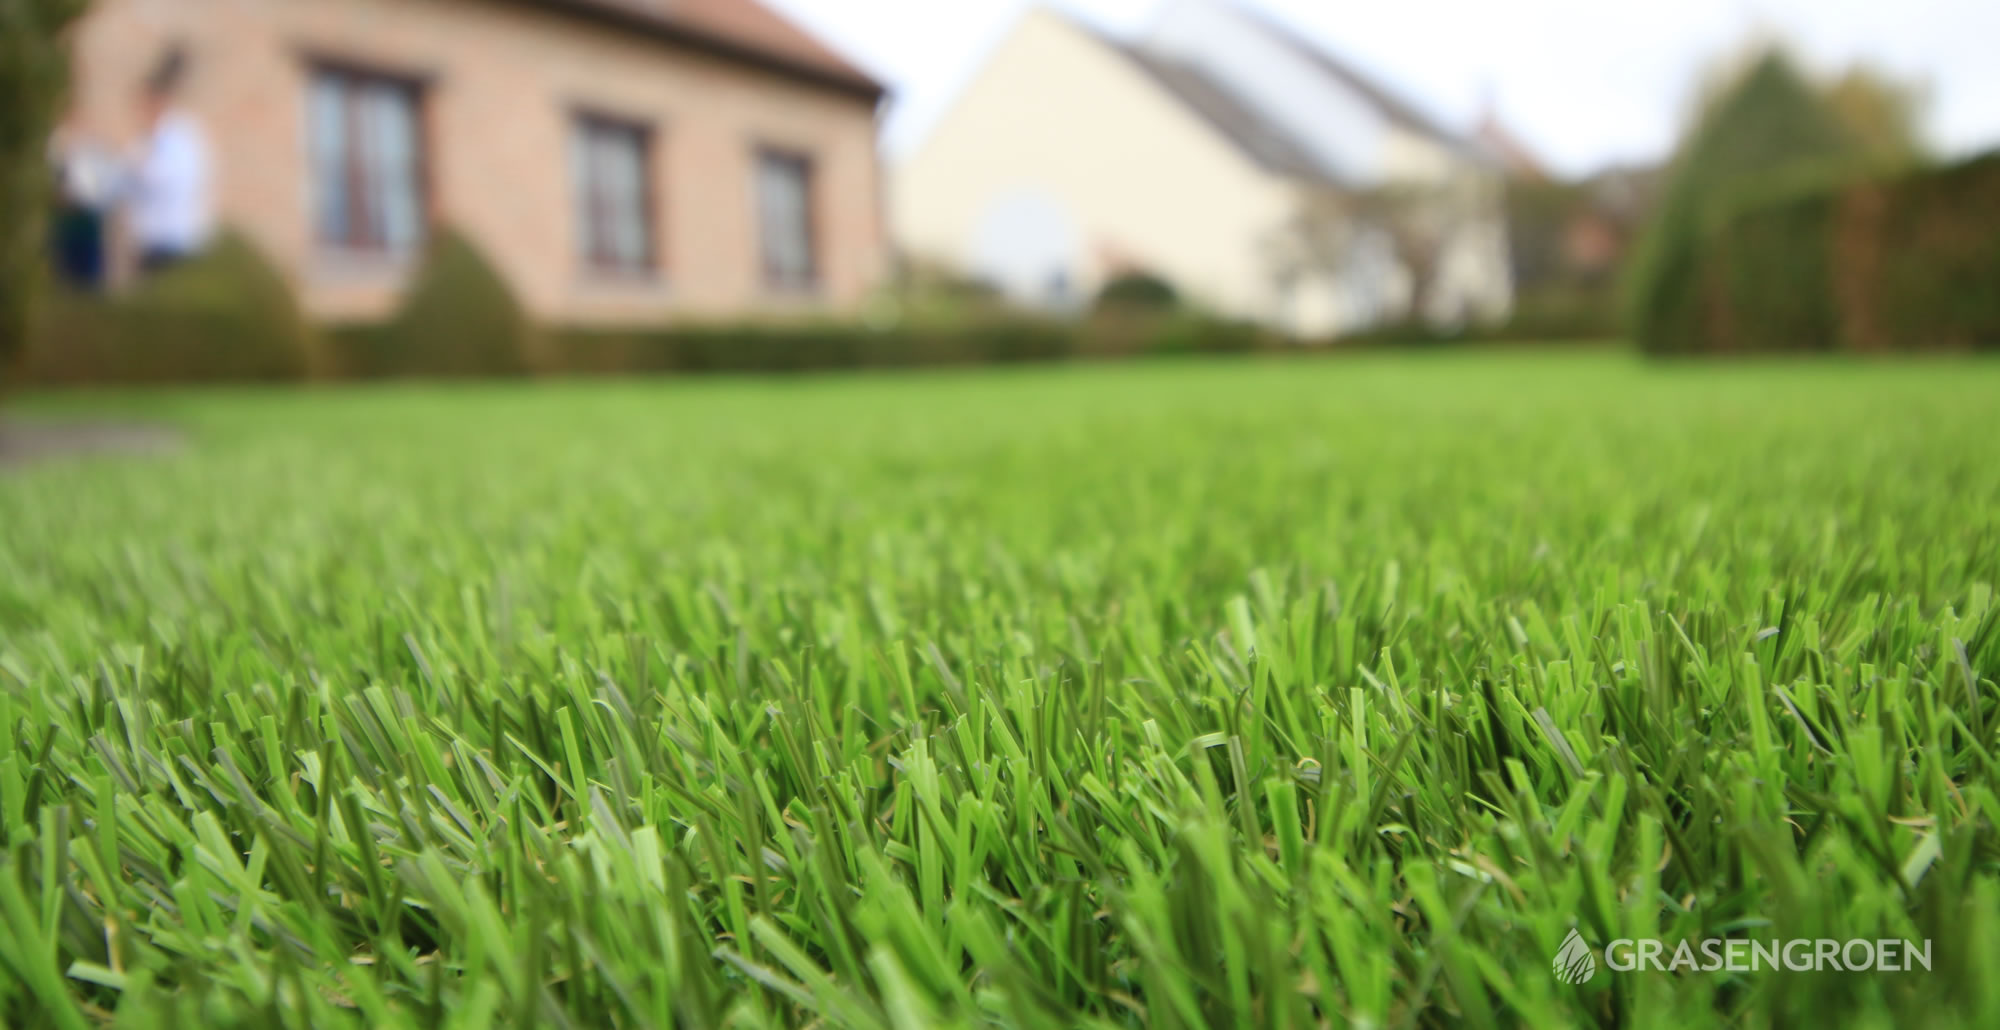 Kunstgrasleggenkermt11 • Gras en Groen Kunstgras